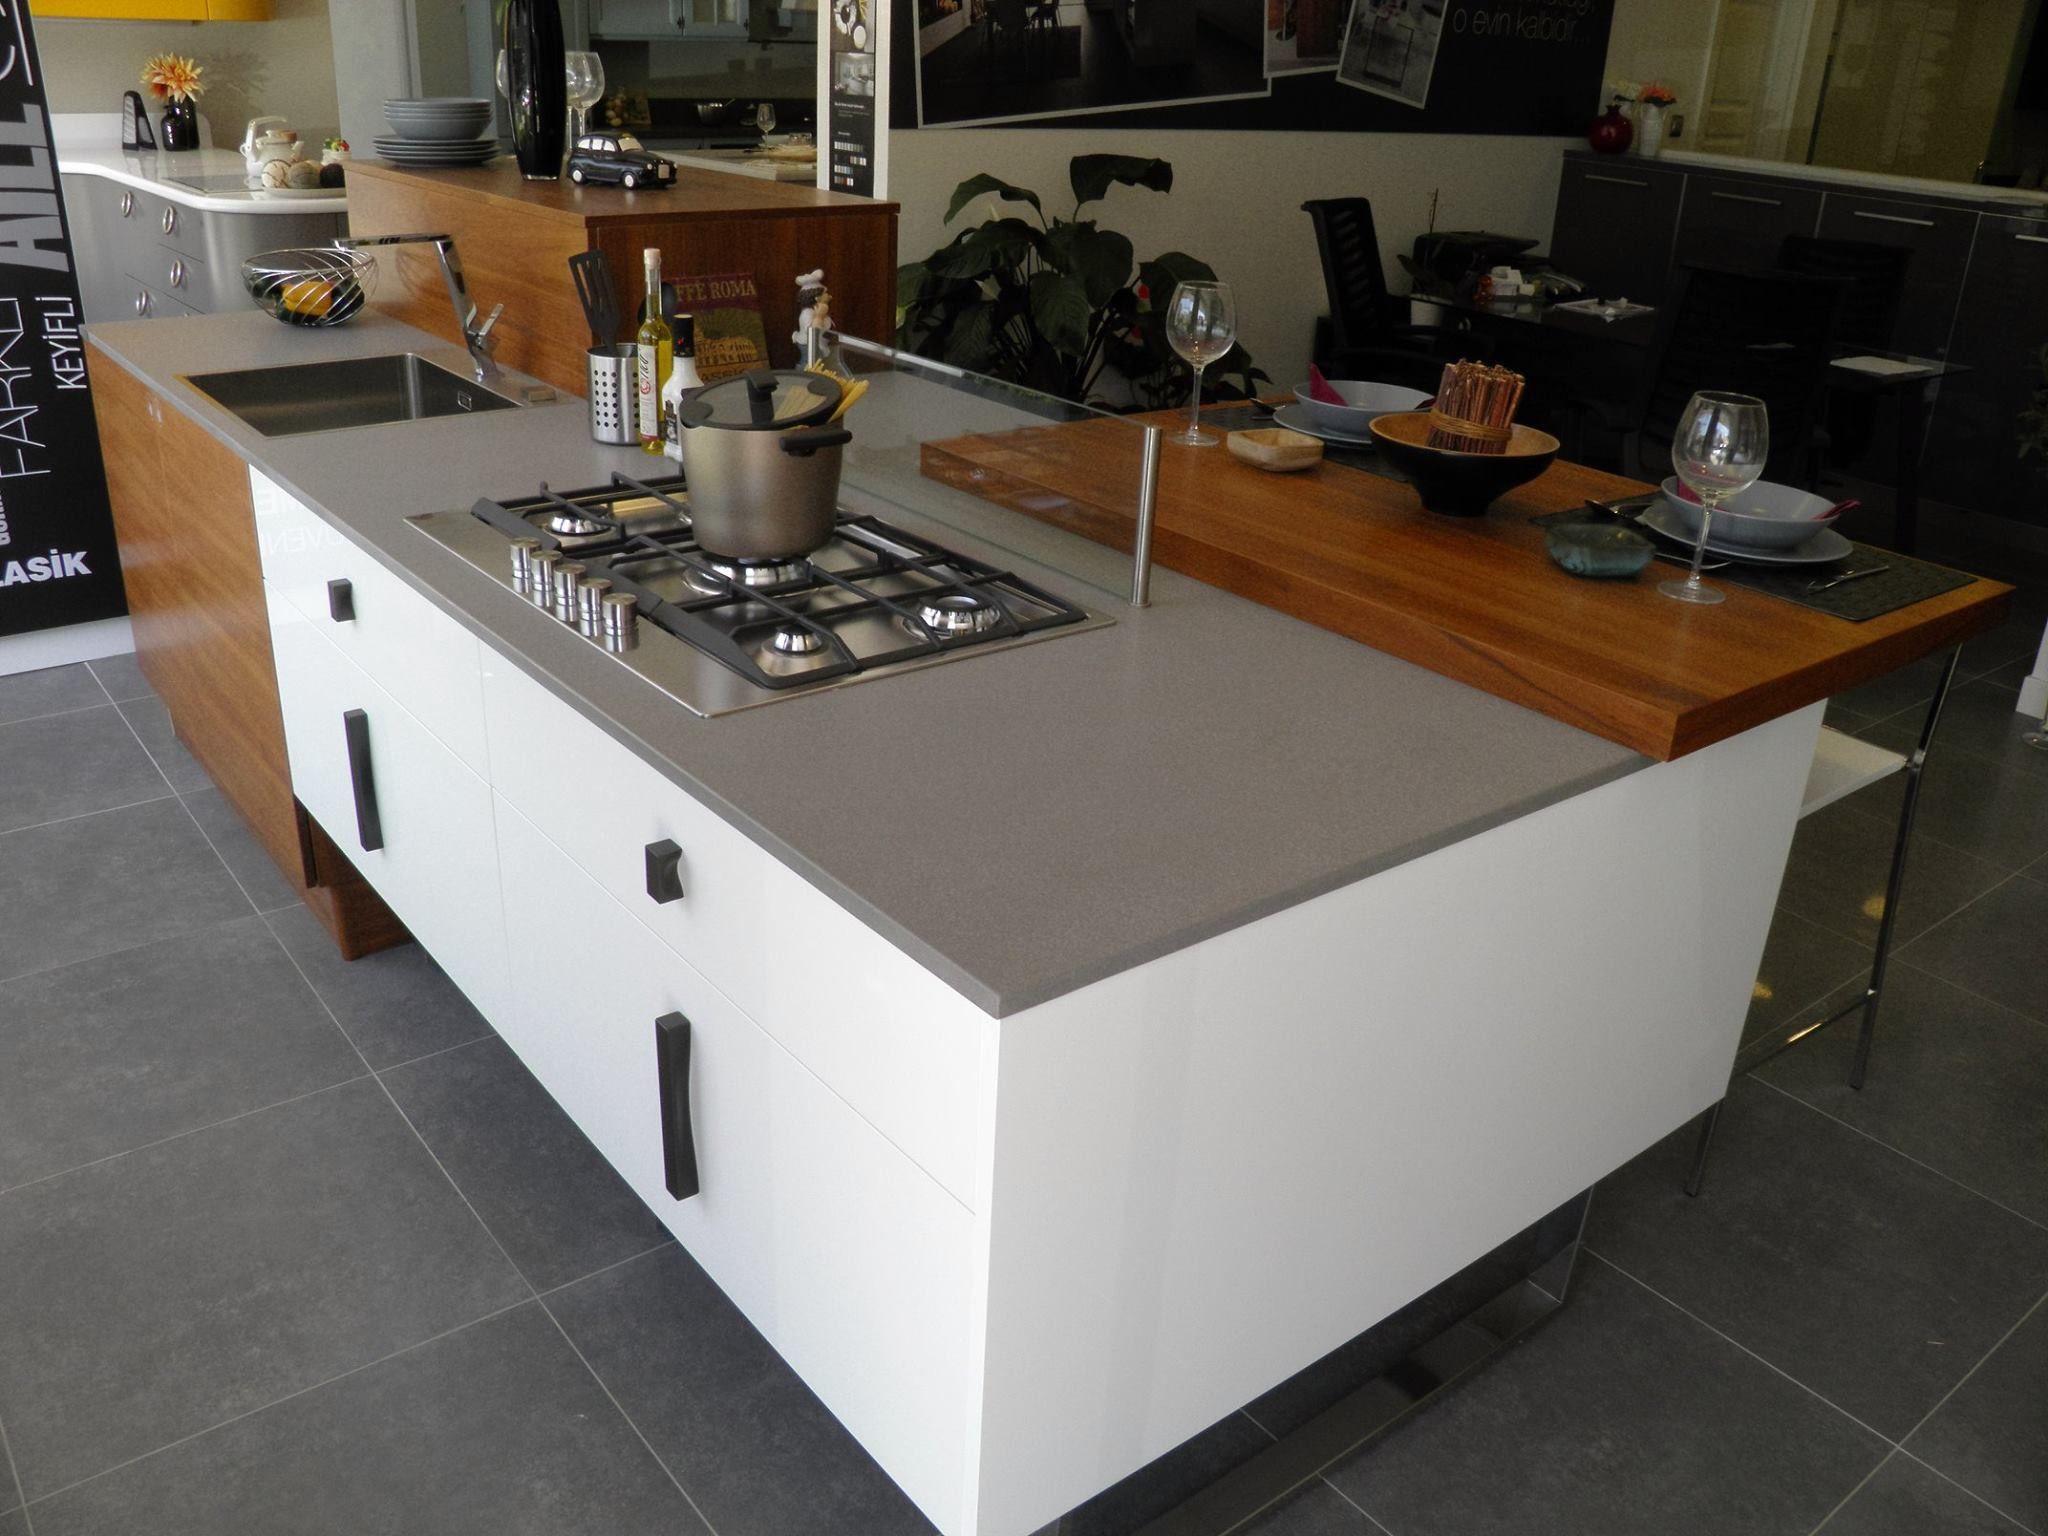 Kitchen countertops silestone grey expo silestone urban for Silestone grey expo